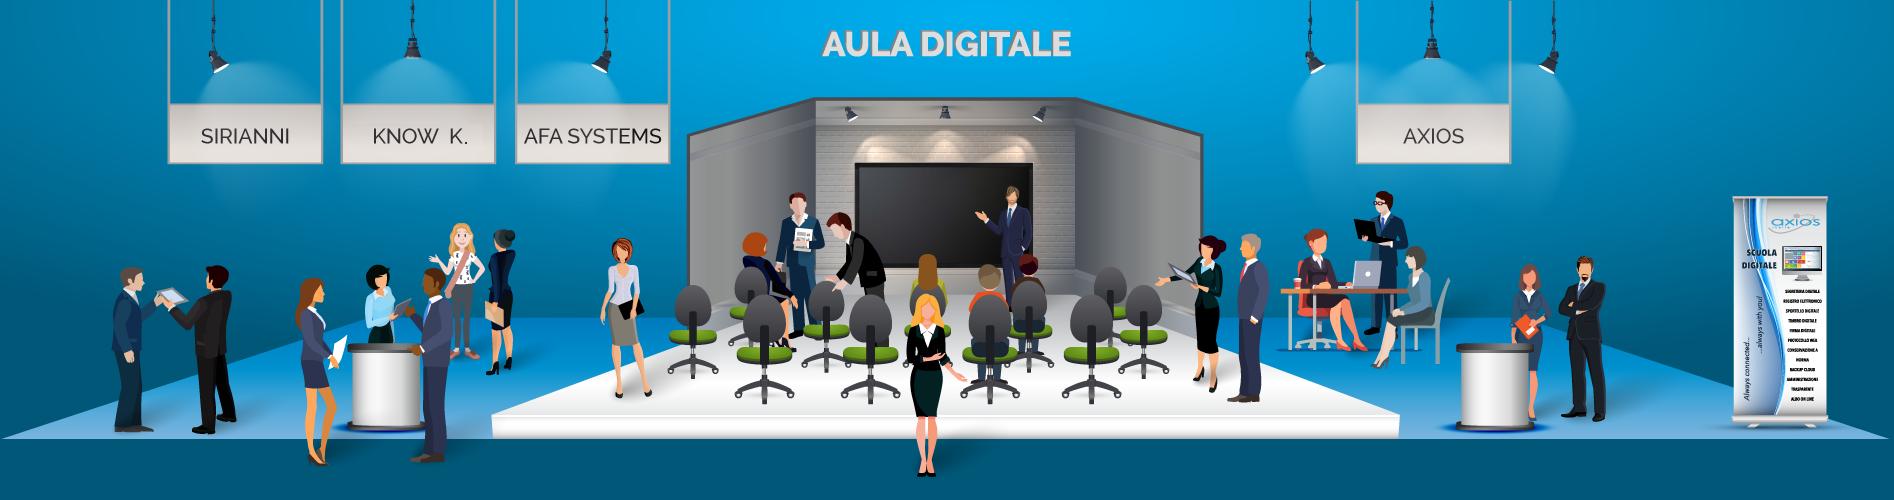 aula_virtuale_axios-n